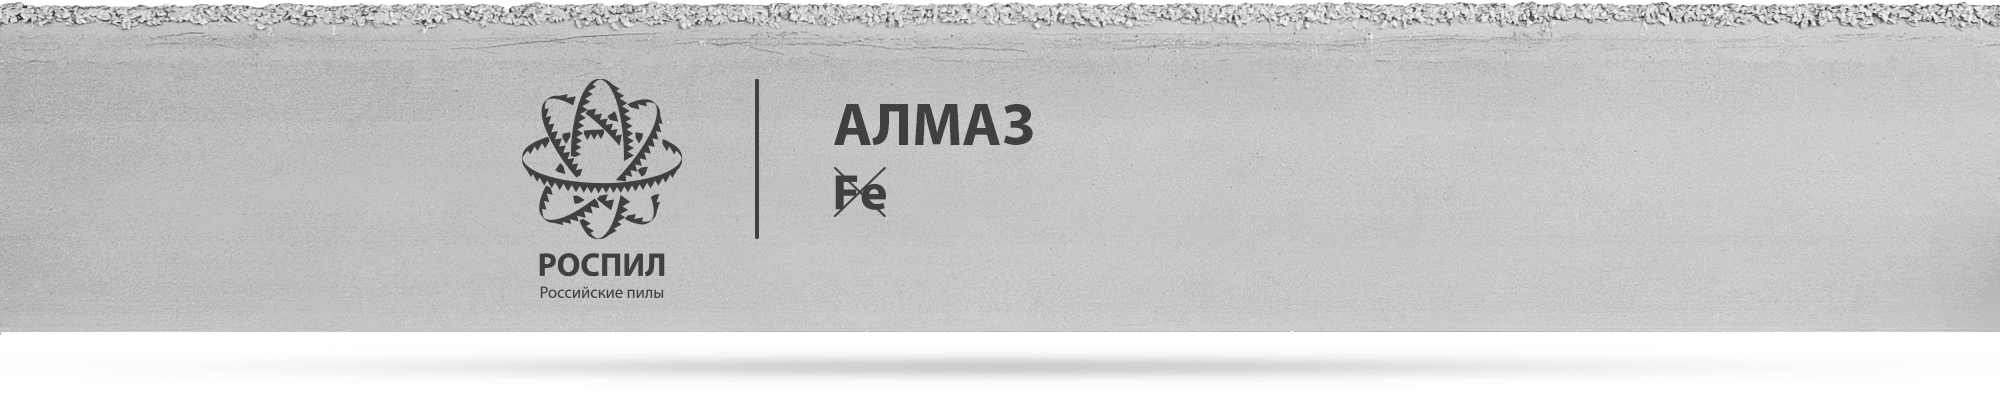 РОСПИЛ АЛМАЗ